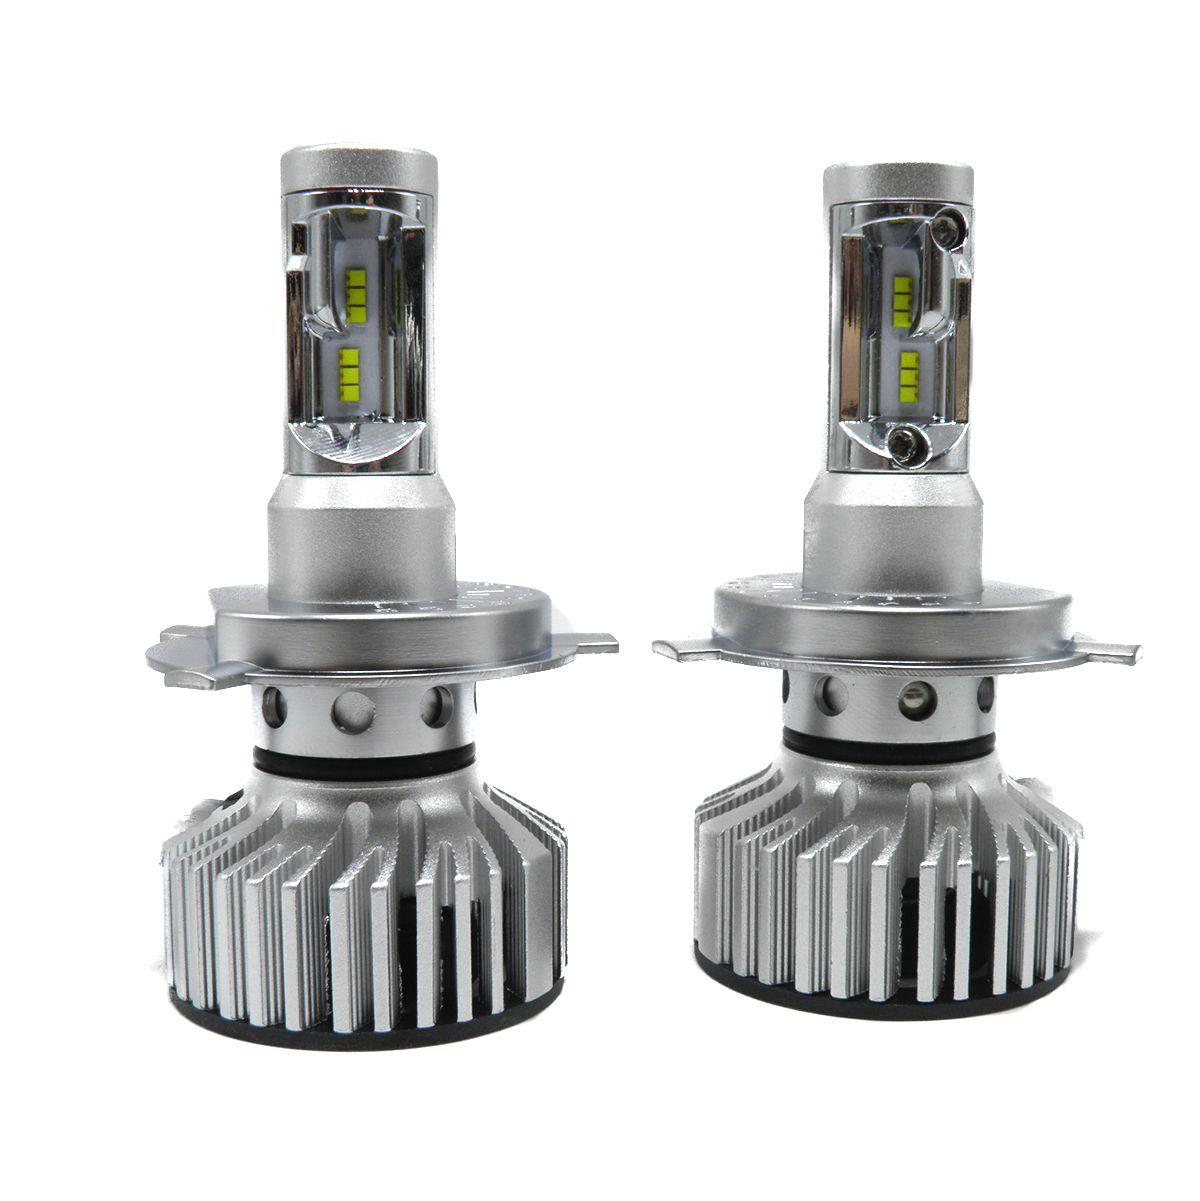 G11 H4 Led Headlight Kit 6000 6500k 12 24v Adjustable Base Small Size Easy Installation Led Headlights Adjustable Base Headlights